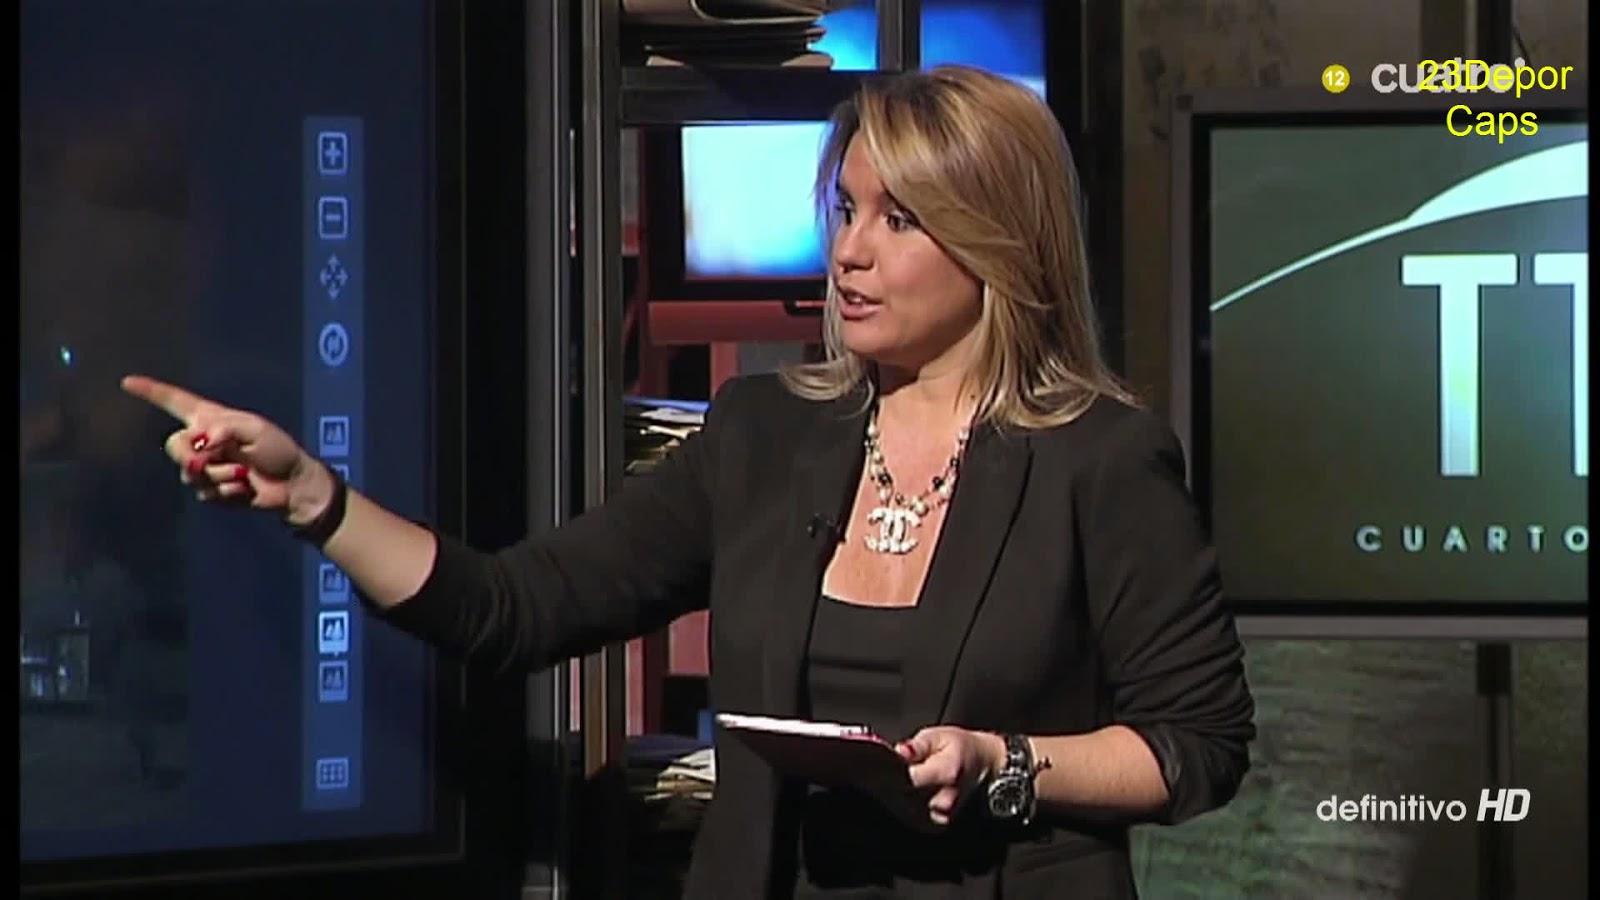 OSFO a Carmen Porter, la presentadora de Cuarto Milenio - Página 3